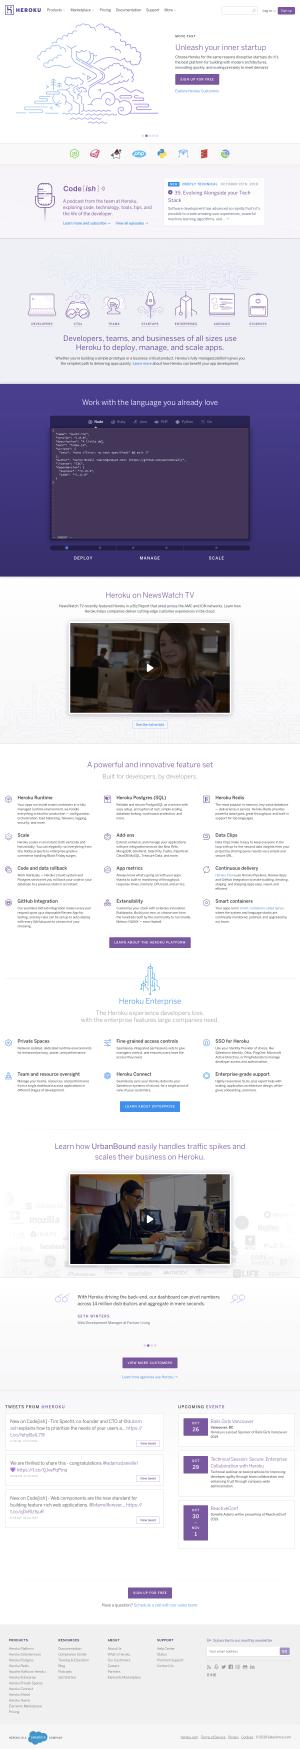 Heroku - Homepage